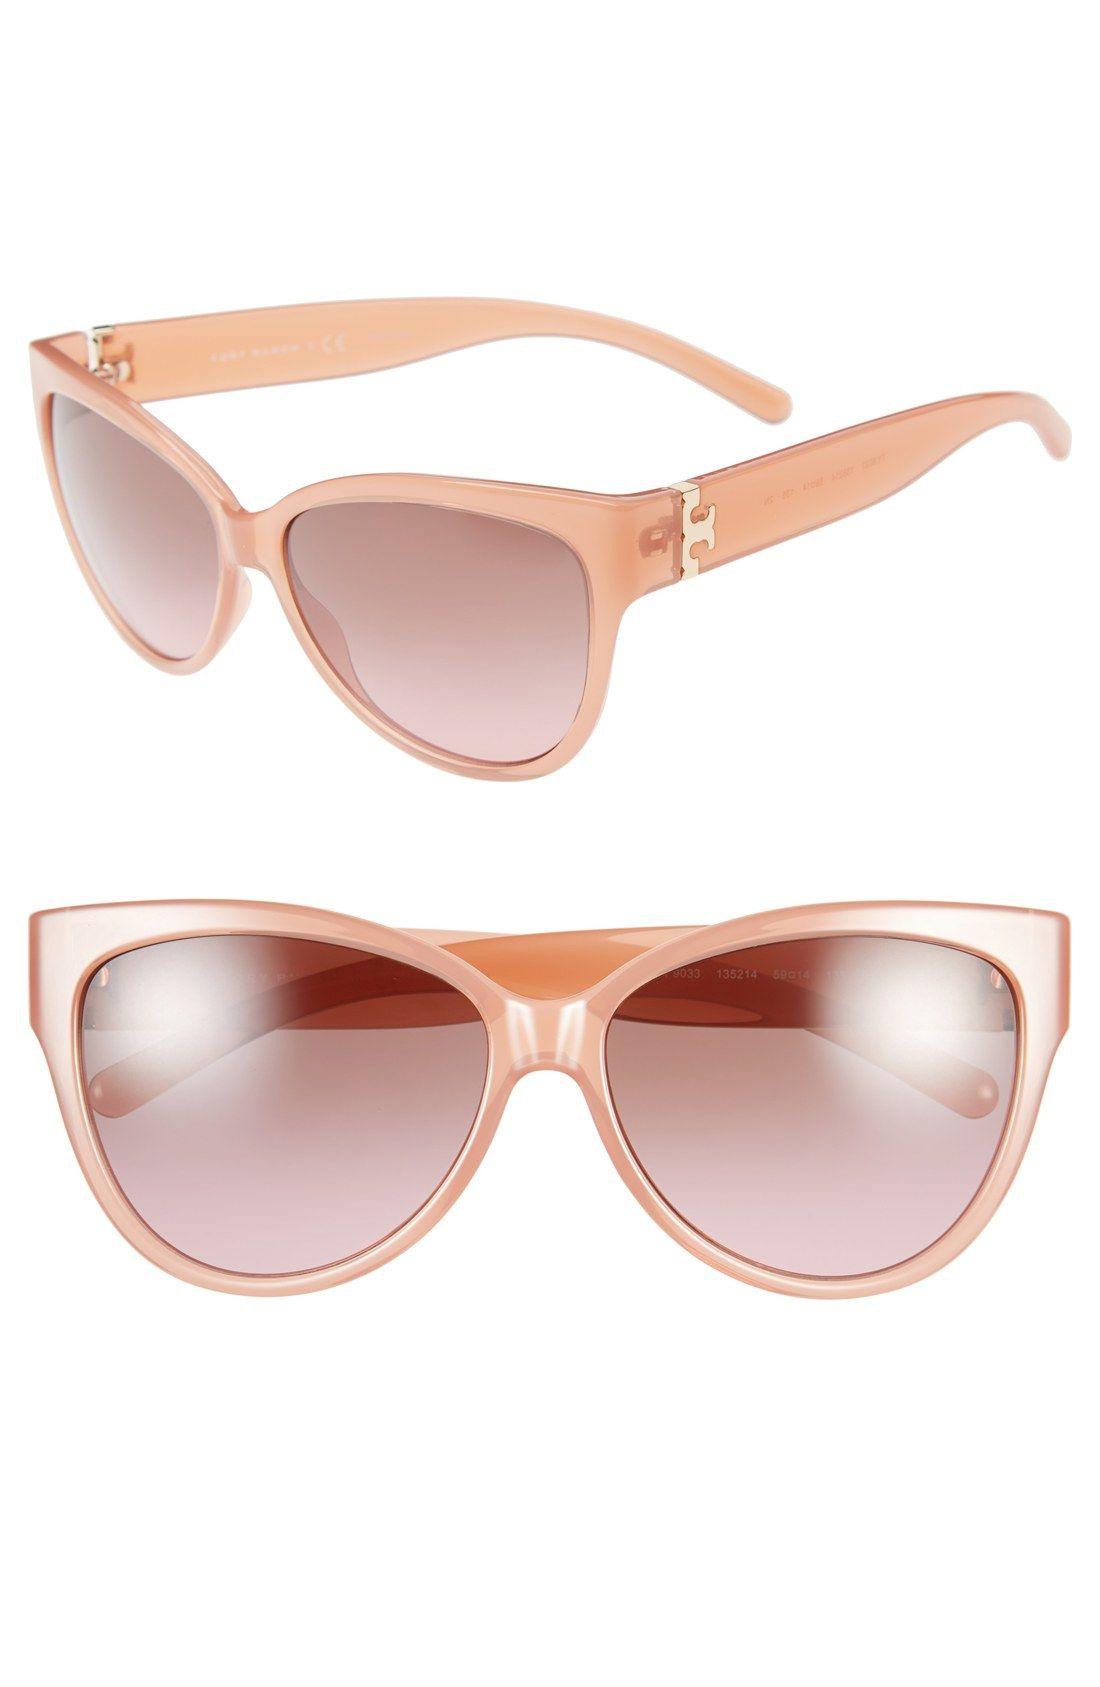 908160f14e0d Loving these pink Tory Burch cat eye sunglasses! | Stylin ...